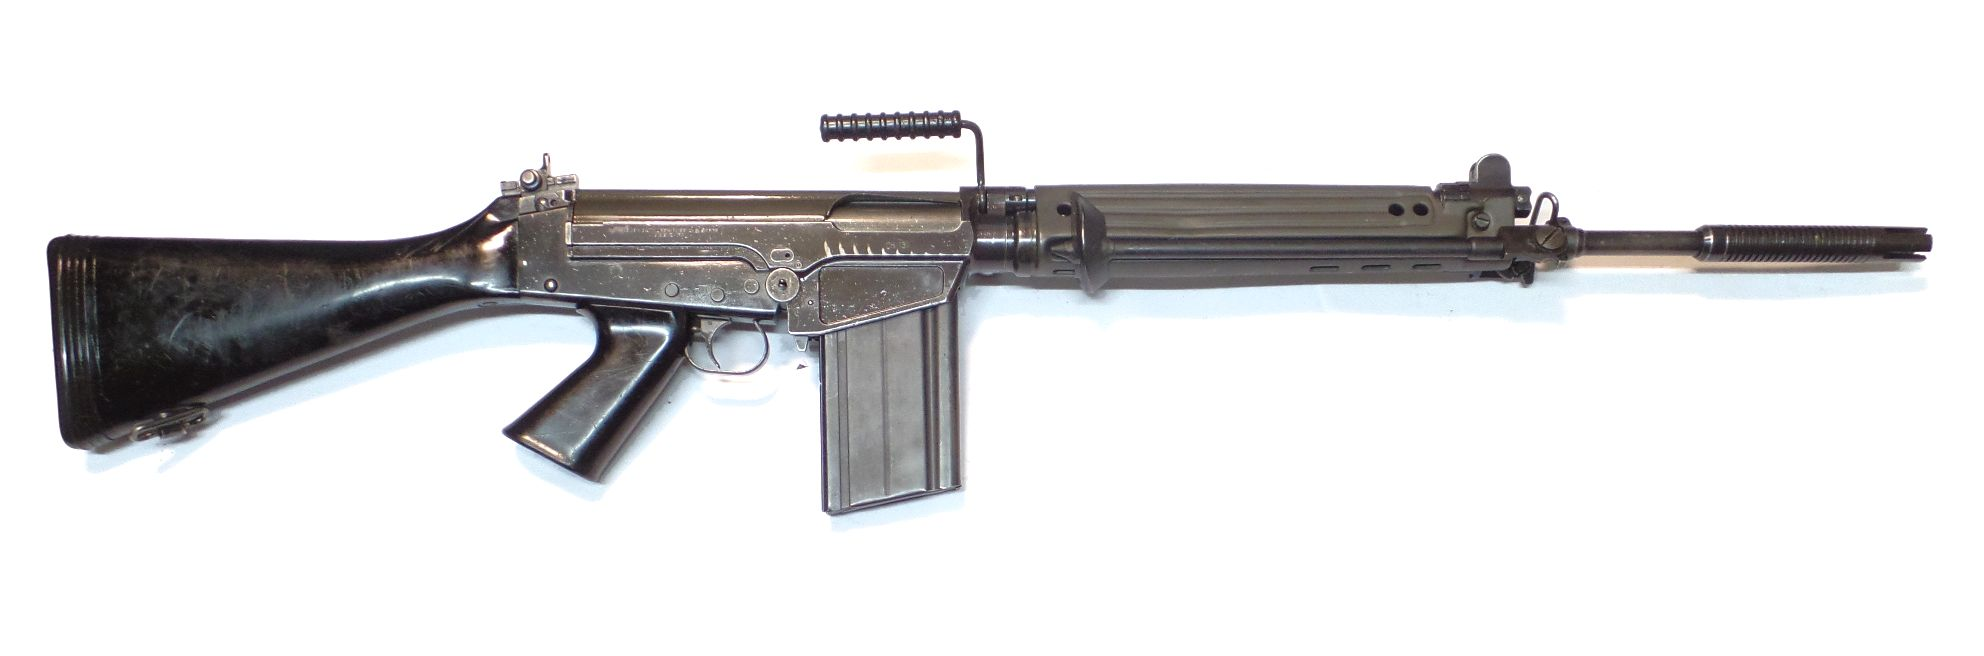 STEYR FAL STG58 calibre .308Winchester